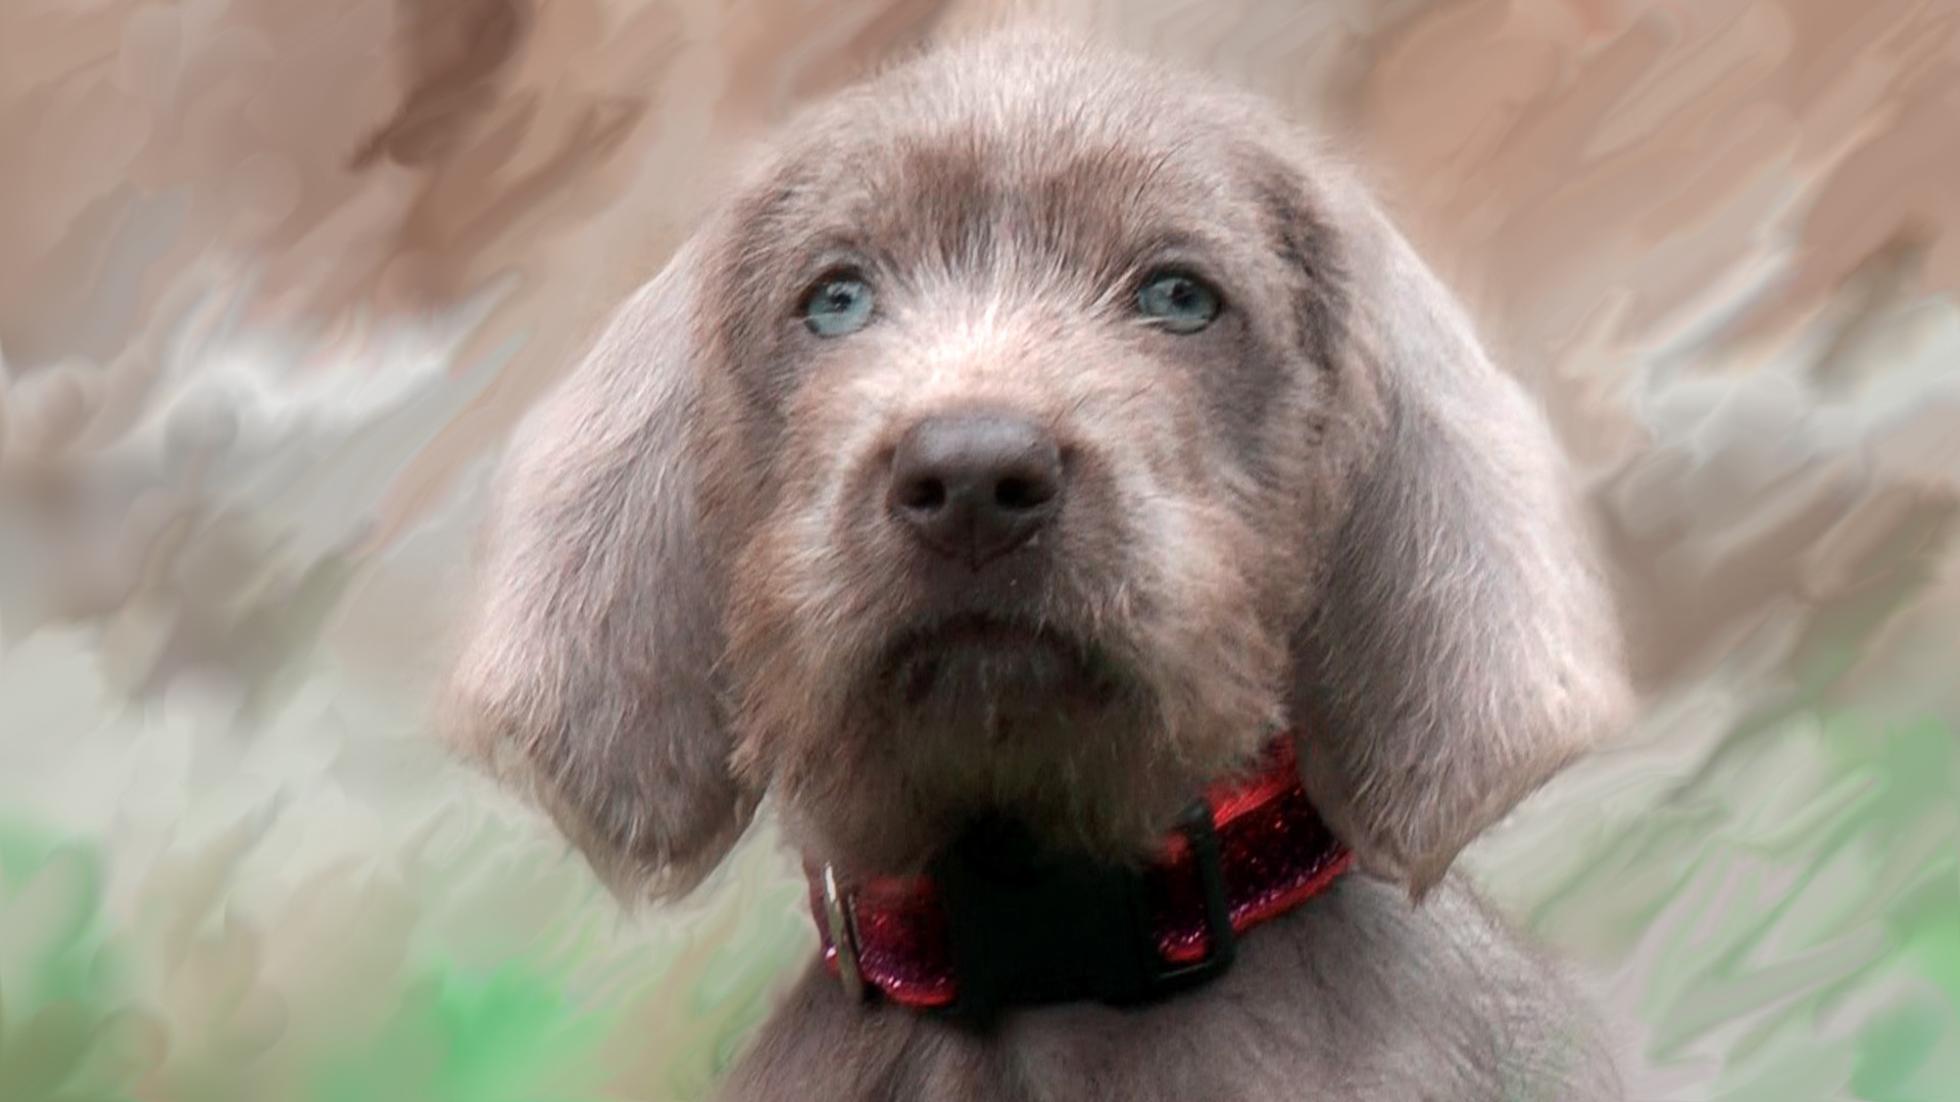 Slovakian Rough-haired Pointer Dog: Slovakian Gundog Training With Jenson And Maise The Slovakian Rough Haired Pointers Breed